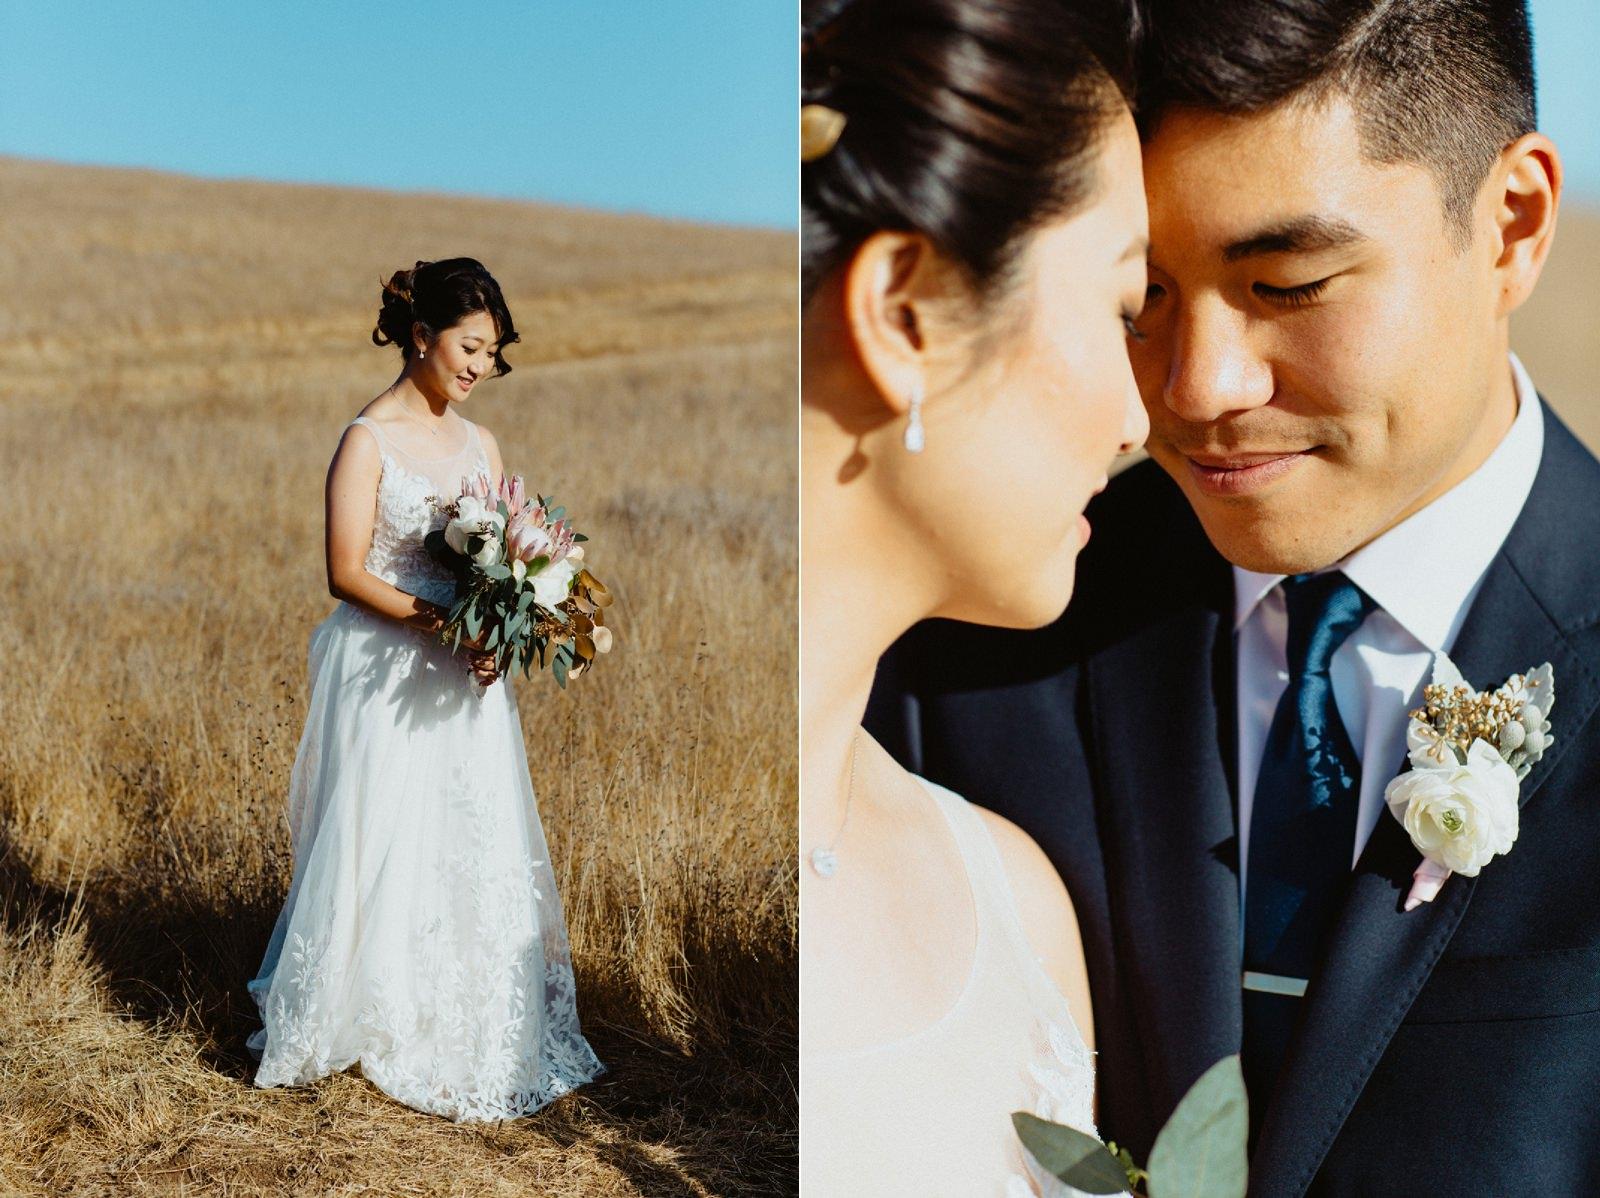 Sally&Jason Palo Alto Wedding59.jpg